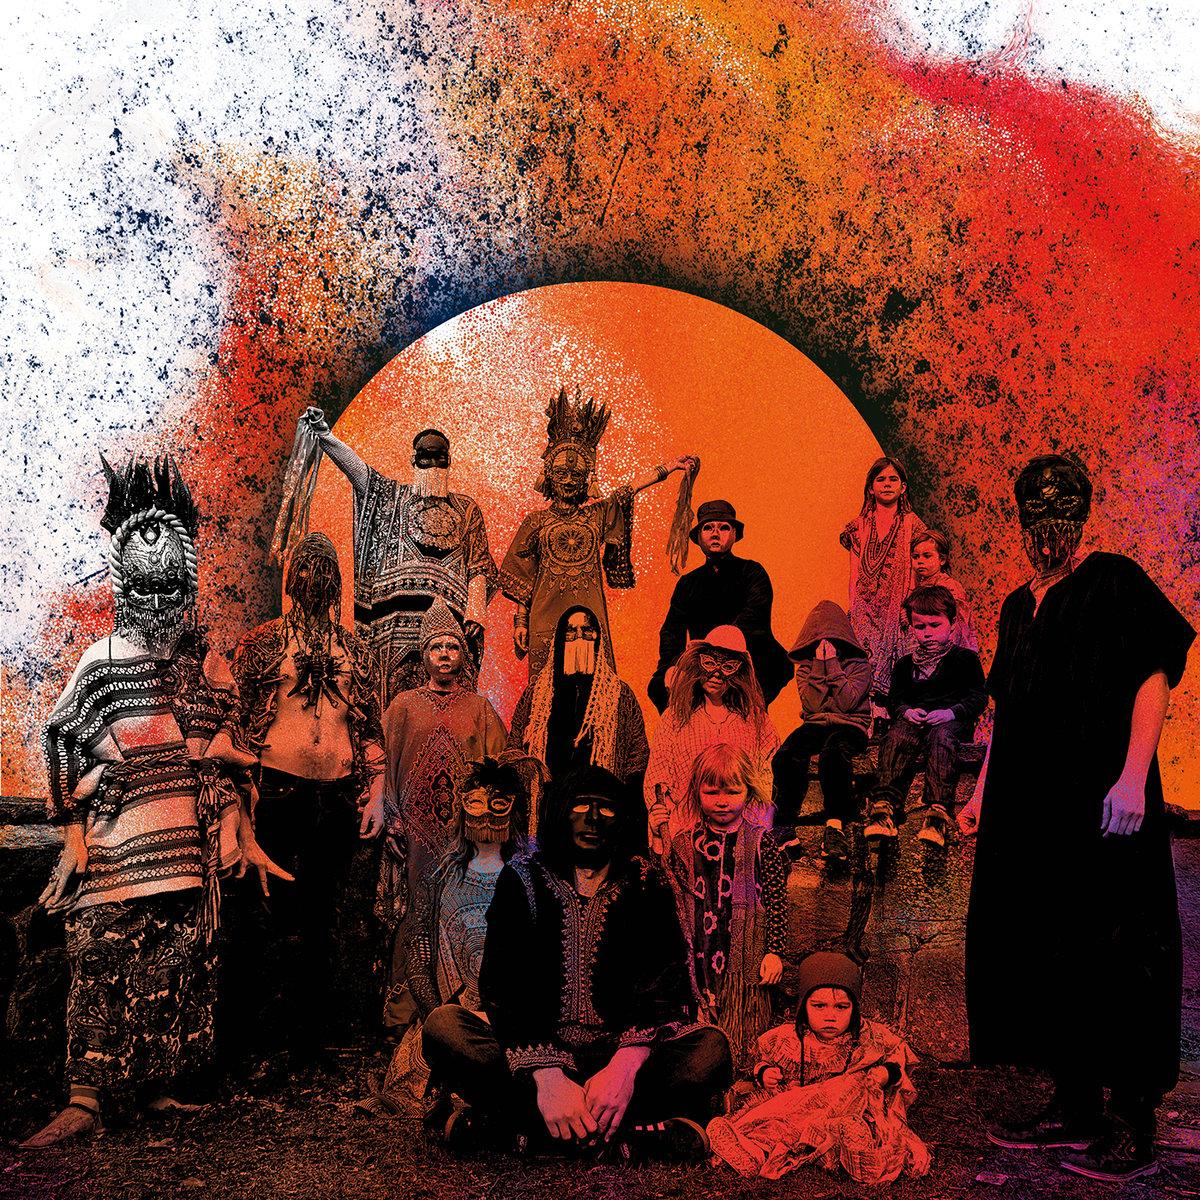 GOAT Requiem - Vinyl 2xLP (black)